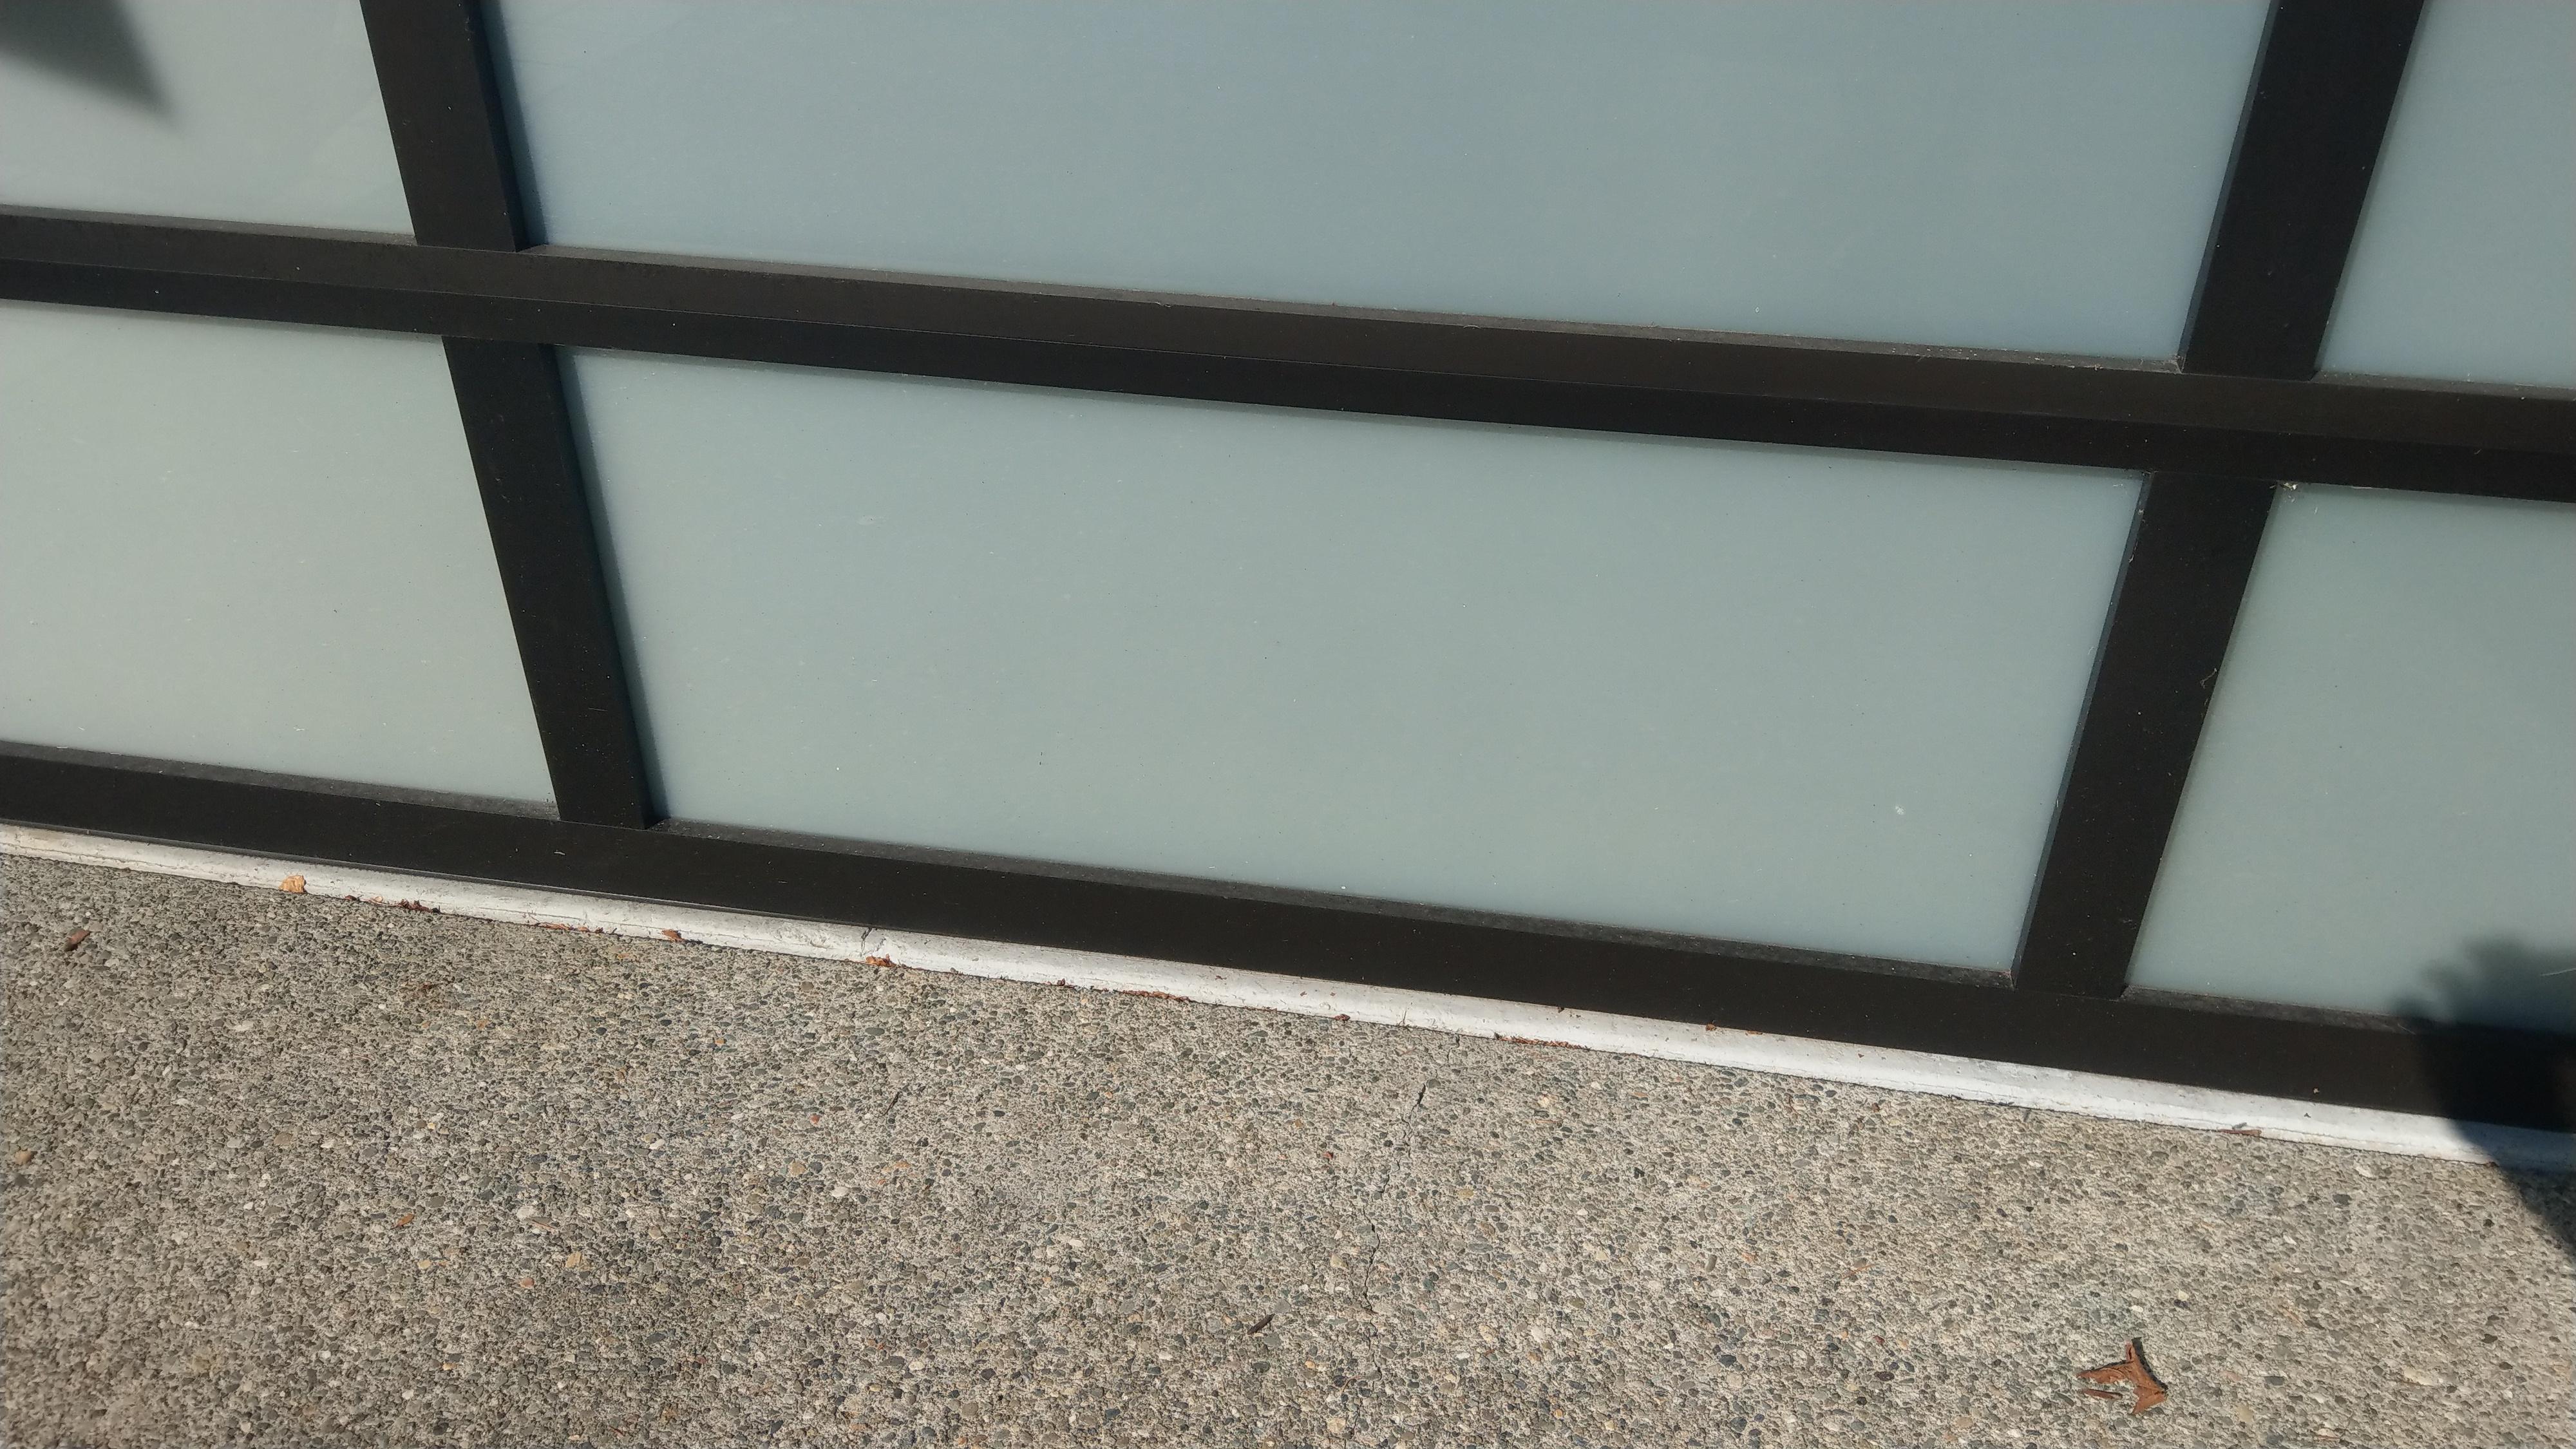 Local Glass Repairs llc